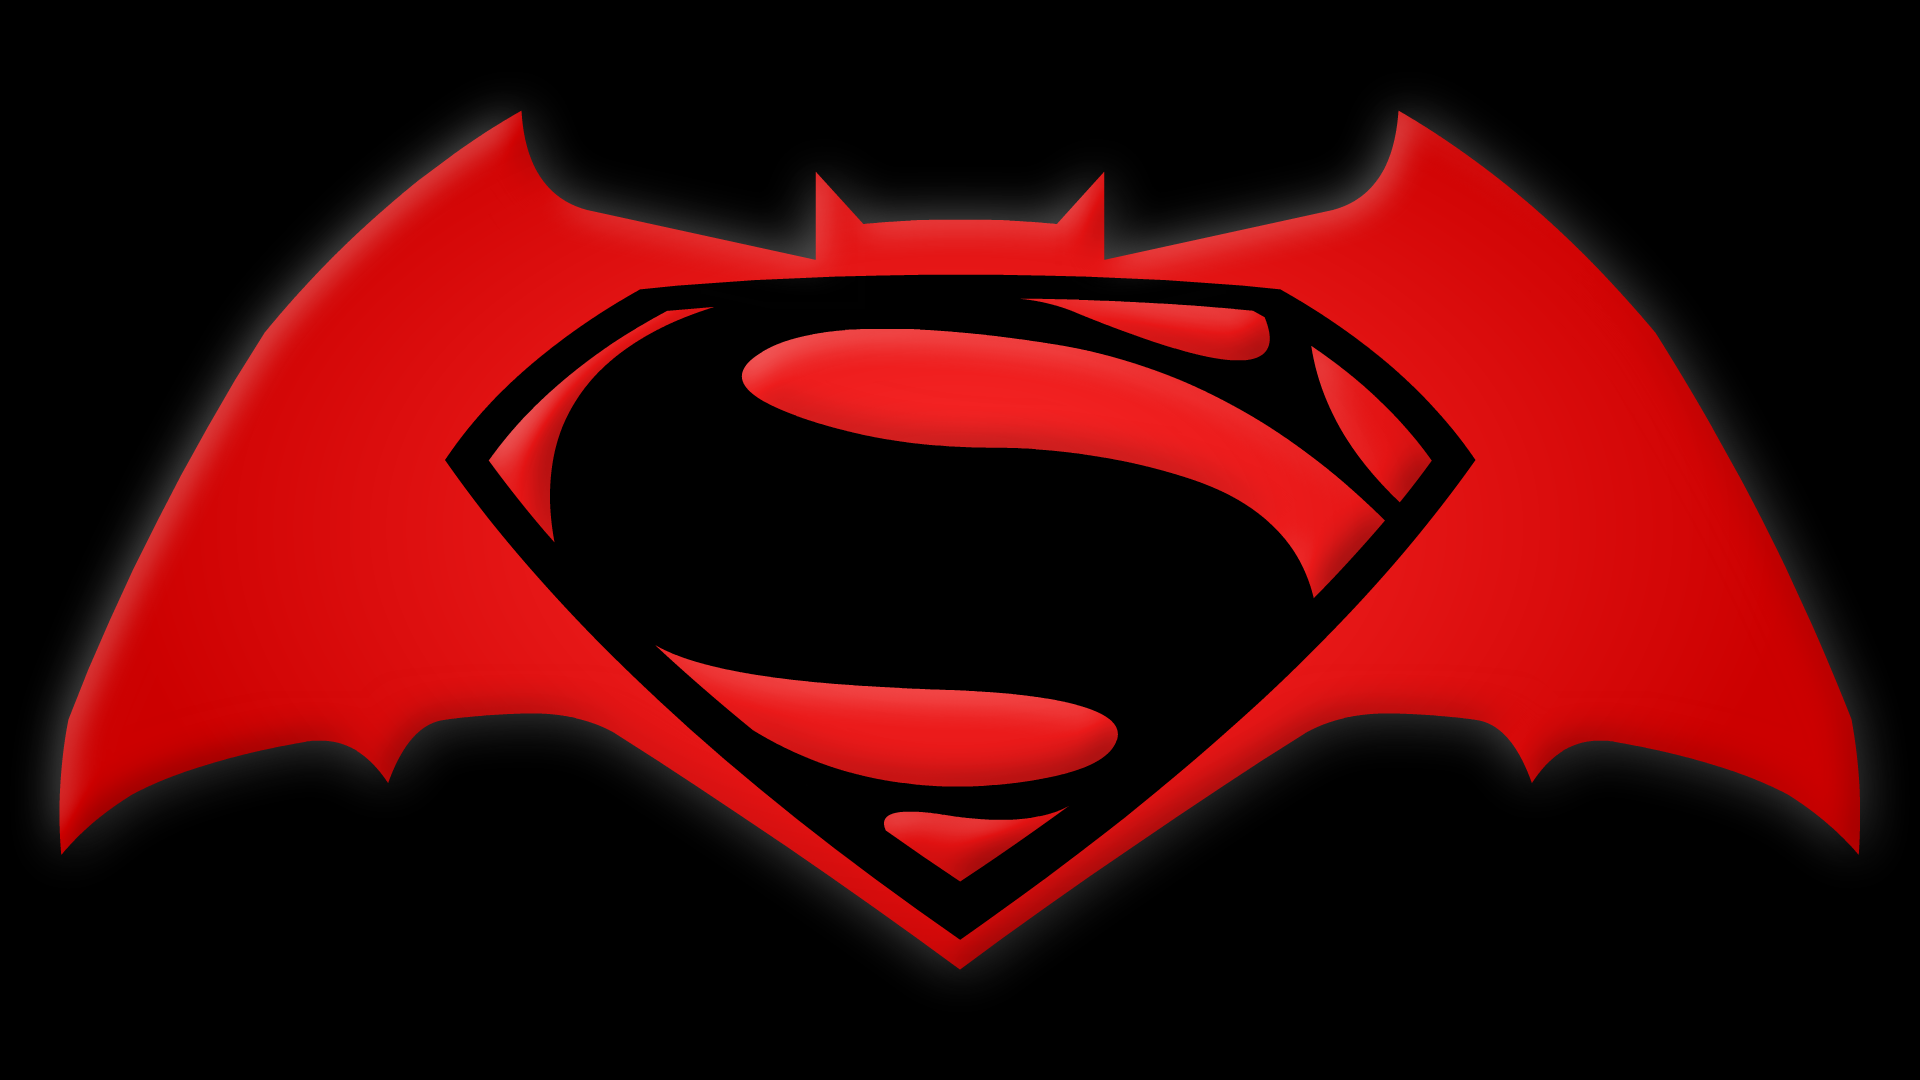 batman v superman symbol by yurtigo on deviantart